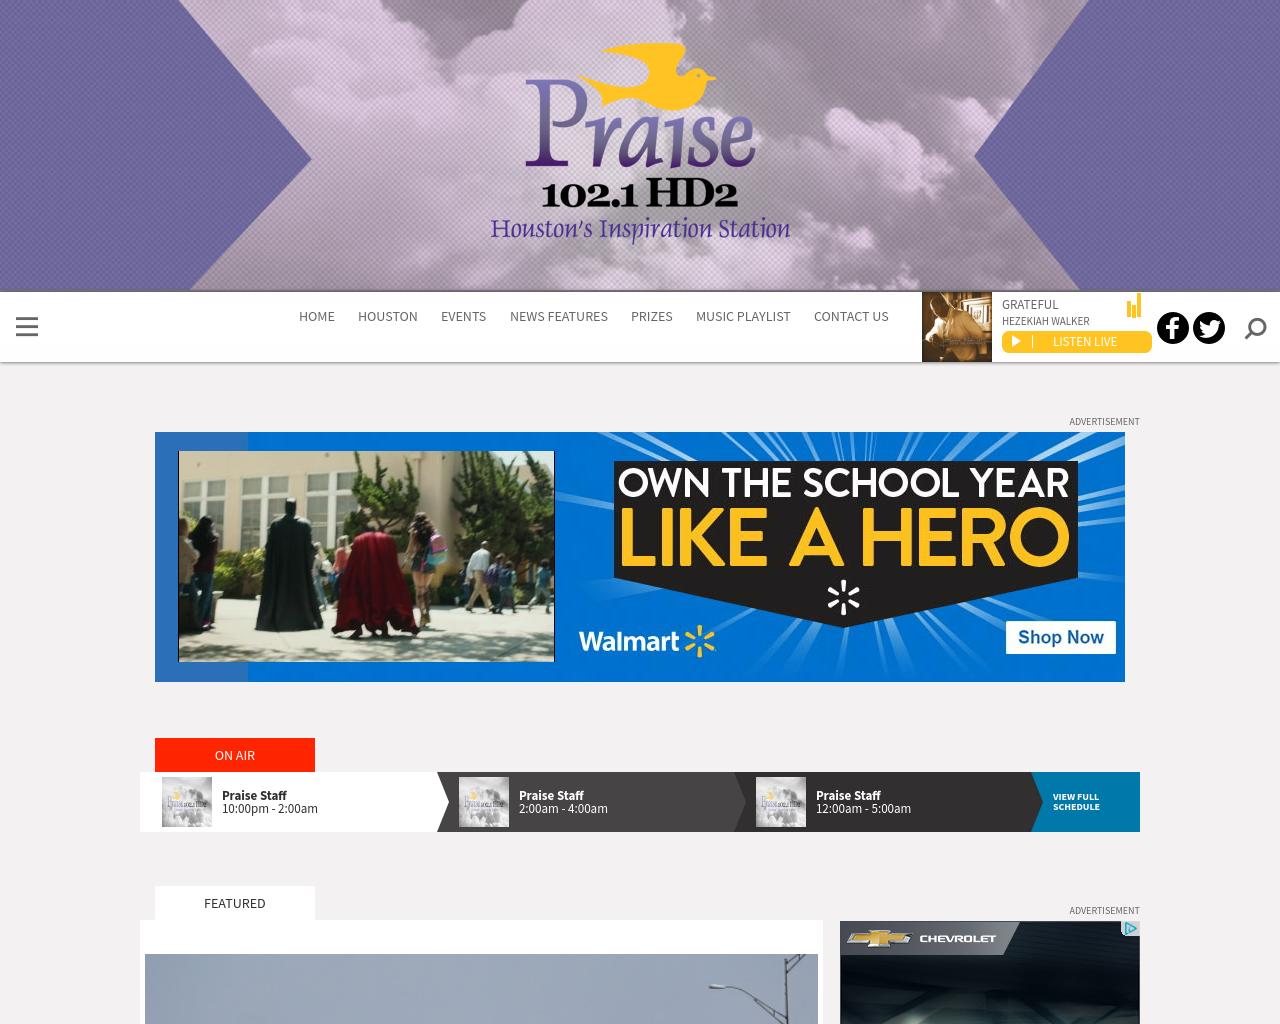 Praise-102.1-HD2-Advertising-Reviews-Pricing